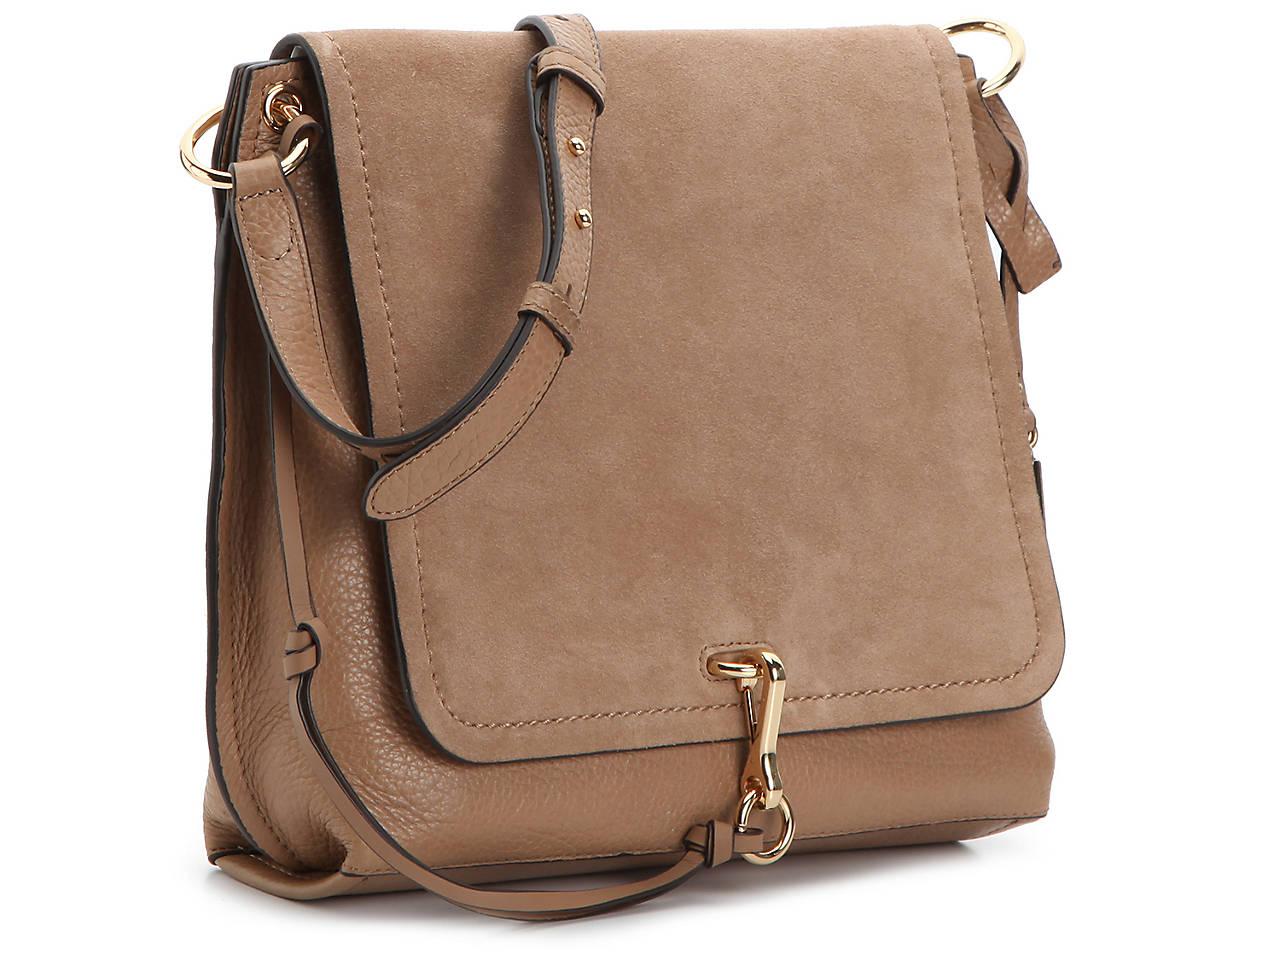 e31f733832 Vince Camuto Blena Leather Crossbody Bag Women s Handbags ...